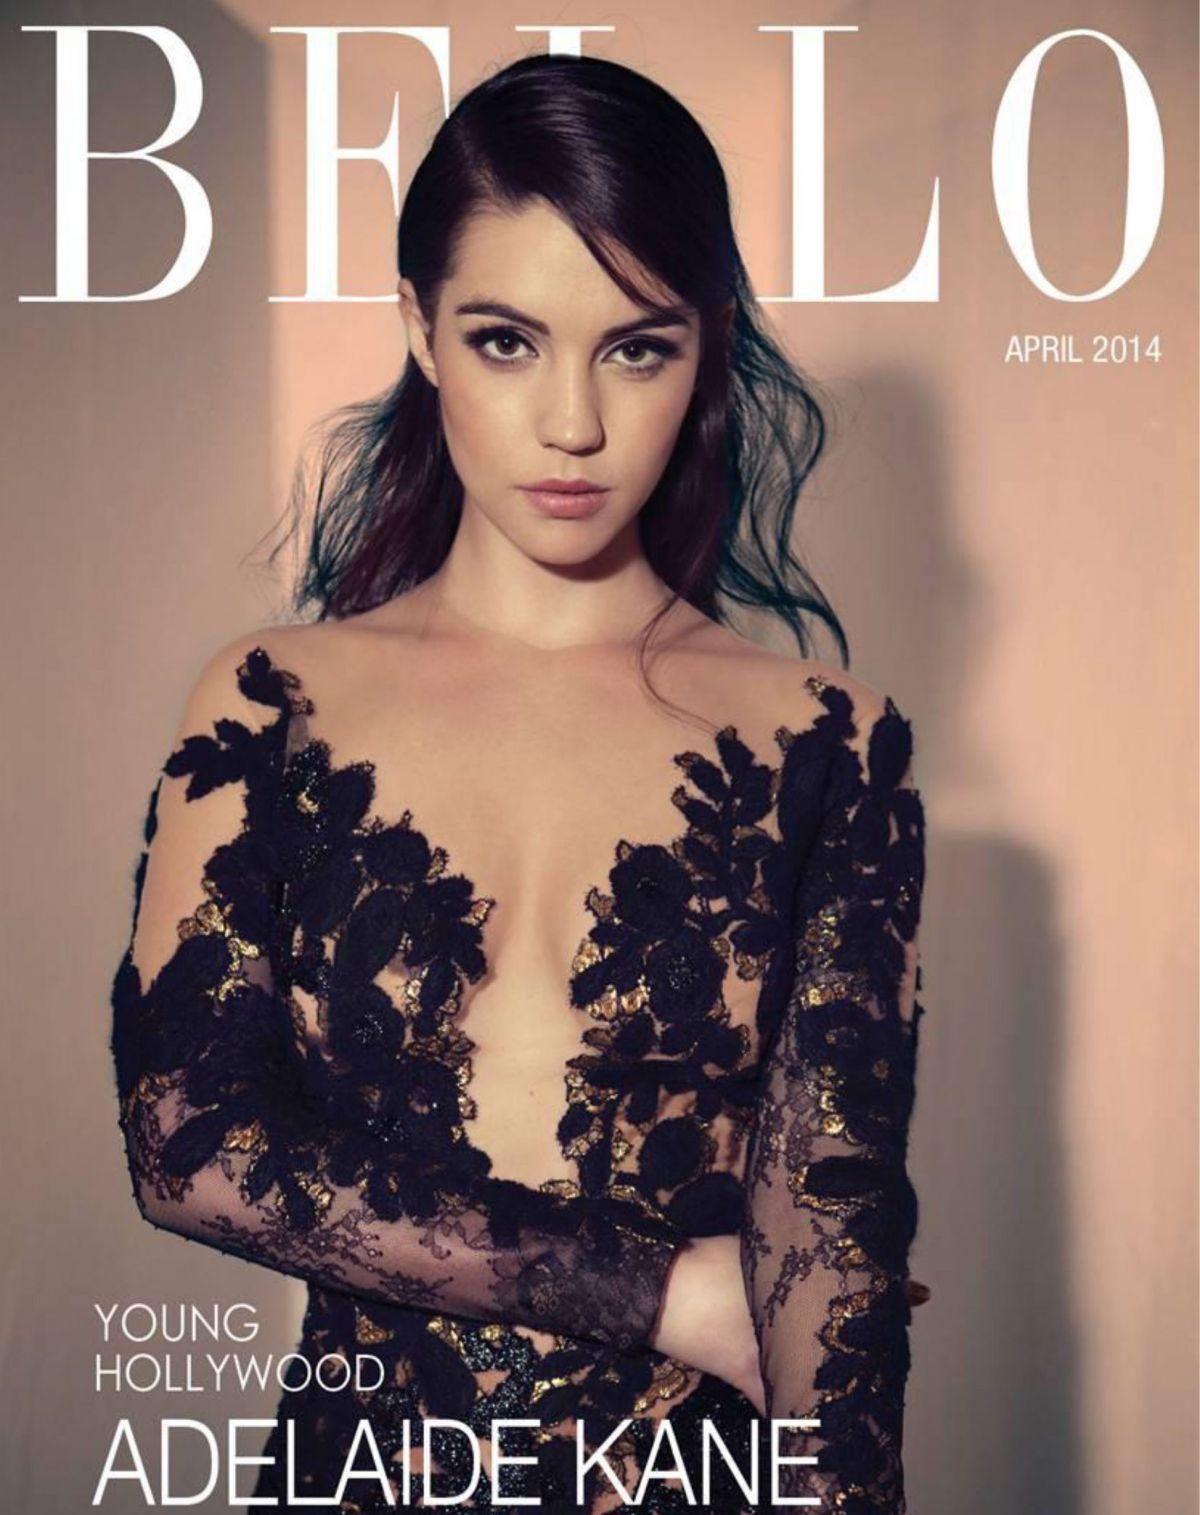 ADELAIDE KANE in Bello Magazine, April 2014 Issue